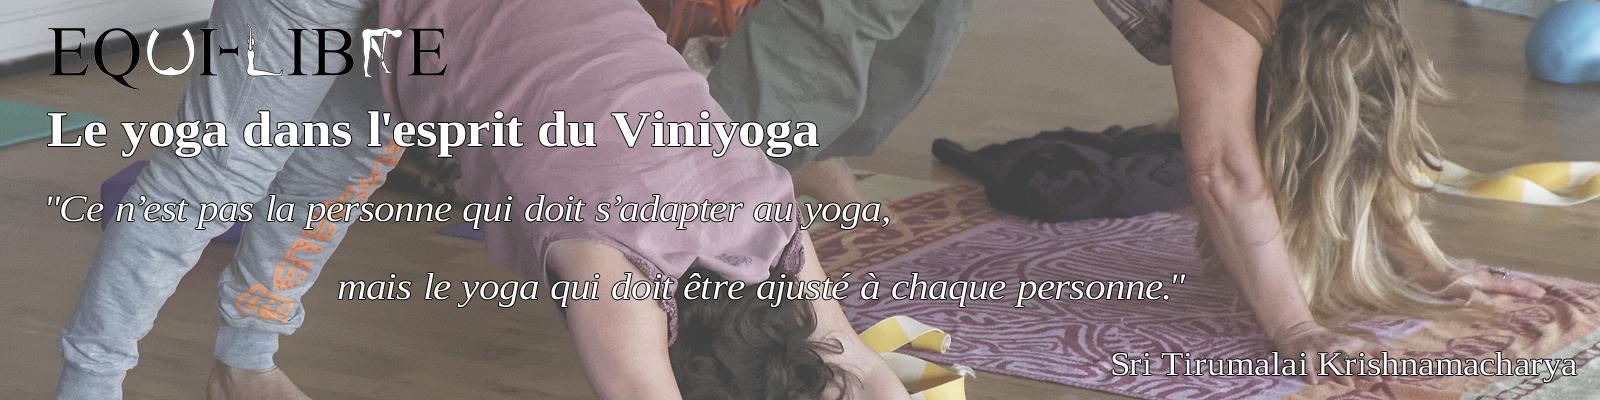 Association de yoga Equi-Libre